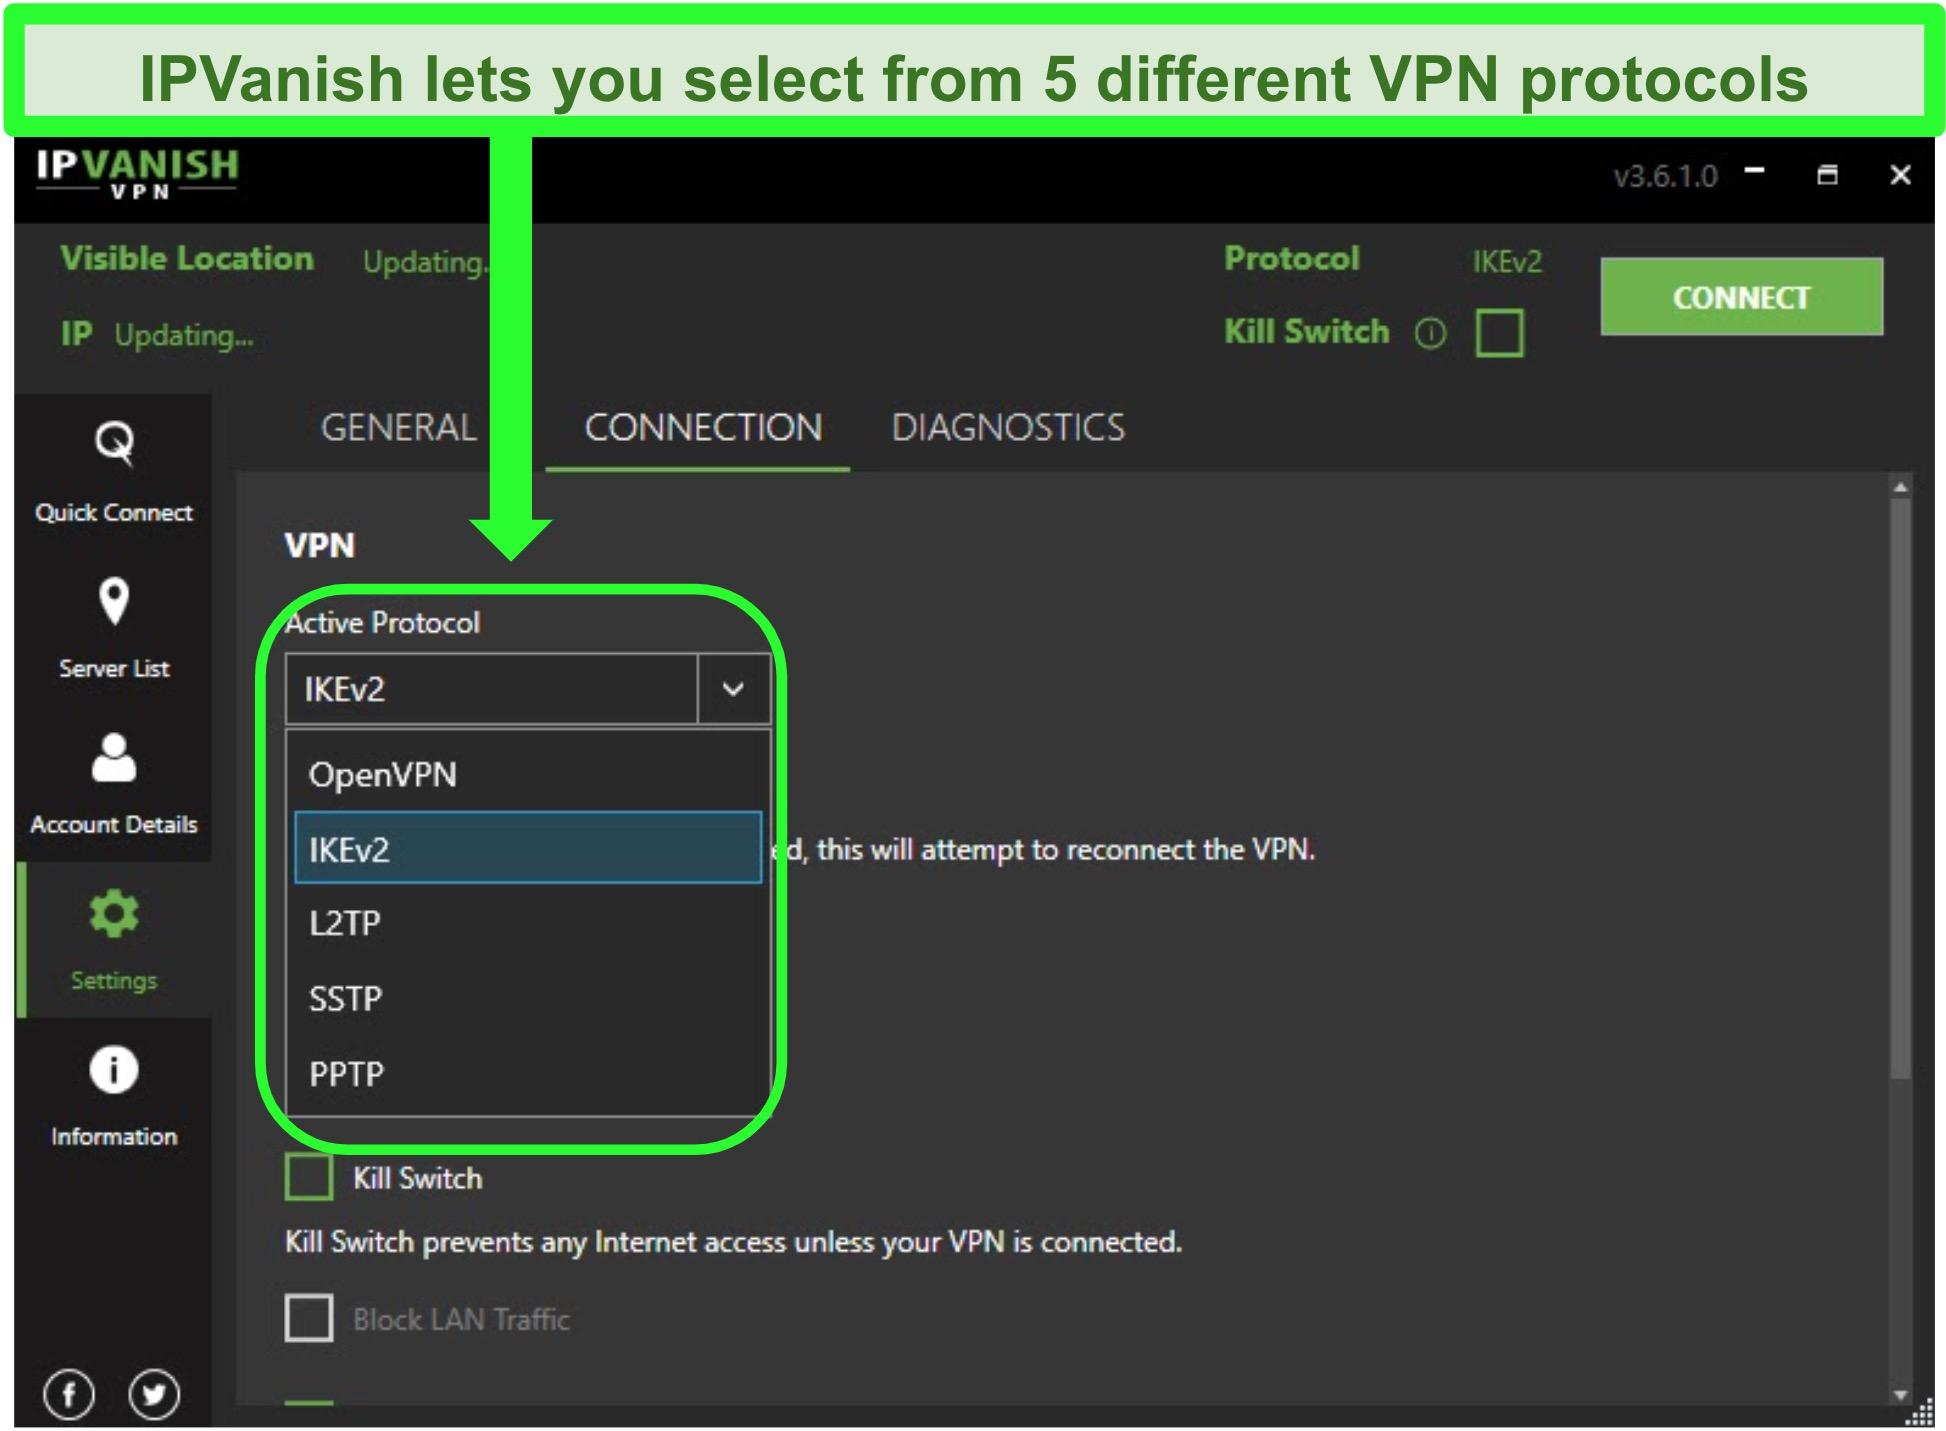 Screenshot of IPVanish's VPN protocol list